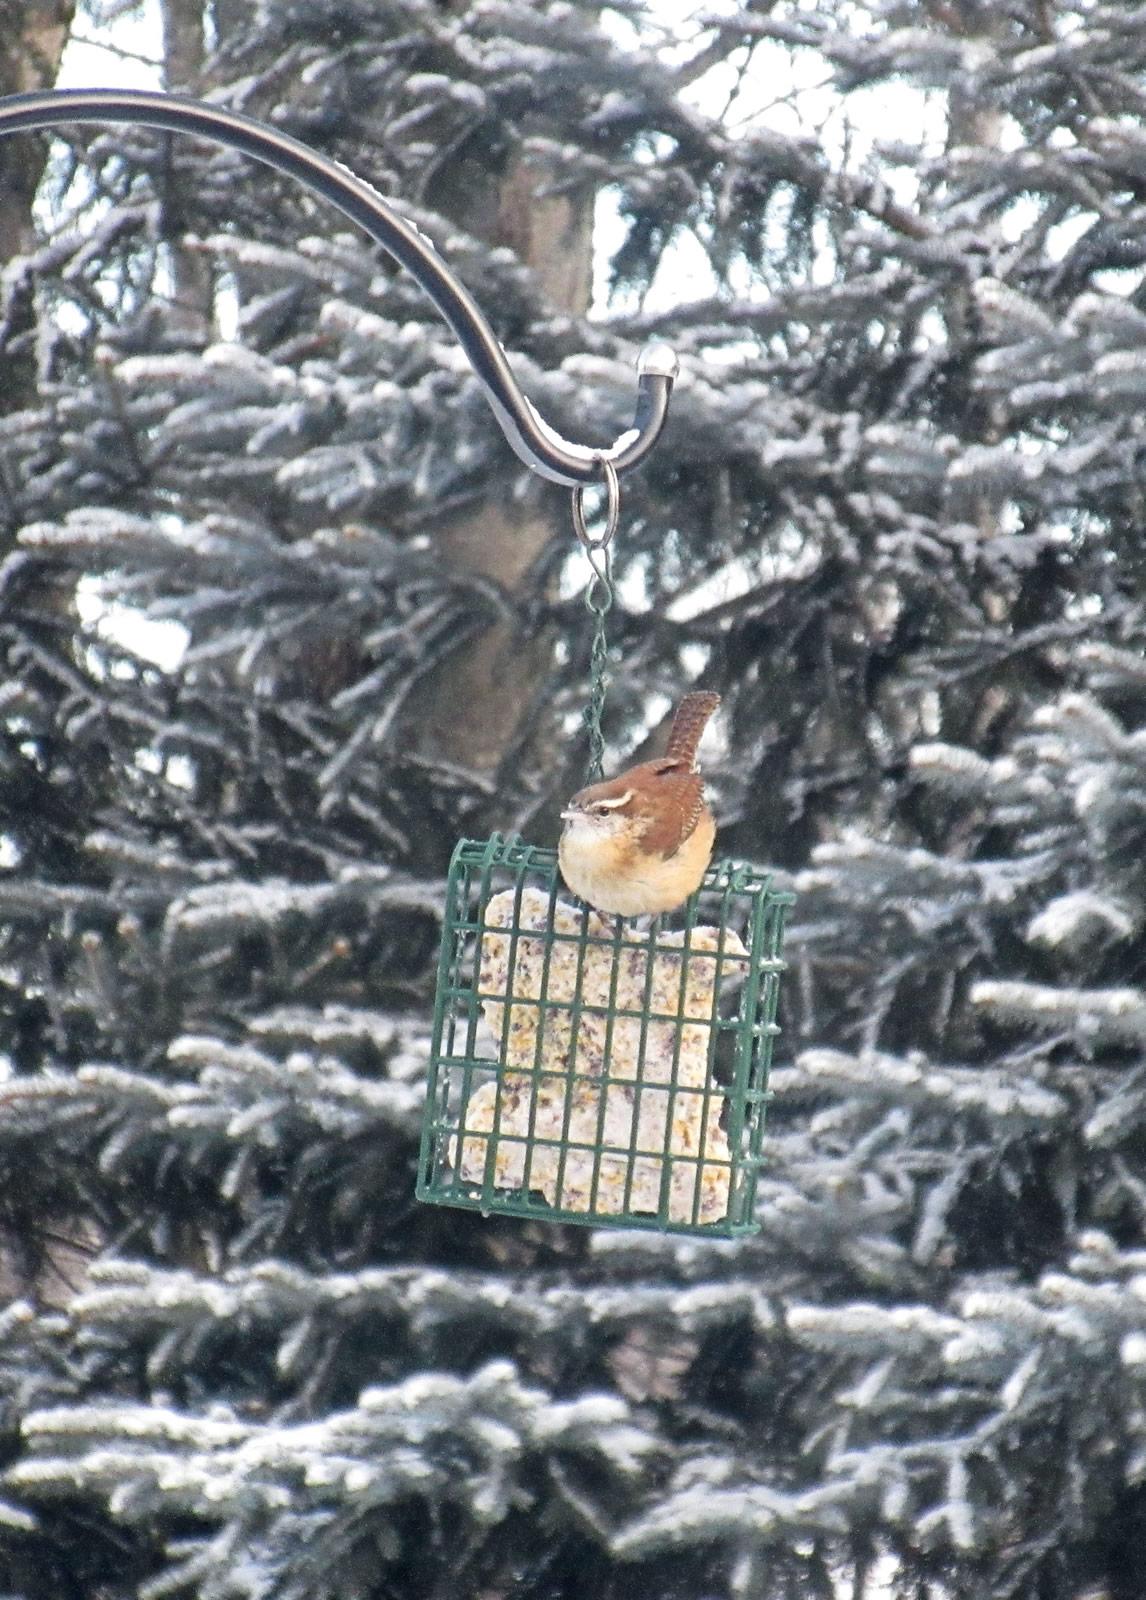 Jenifer Rice/Great Backyard Bird Count